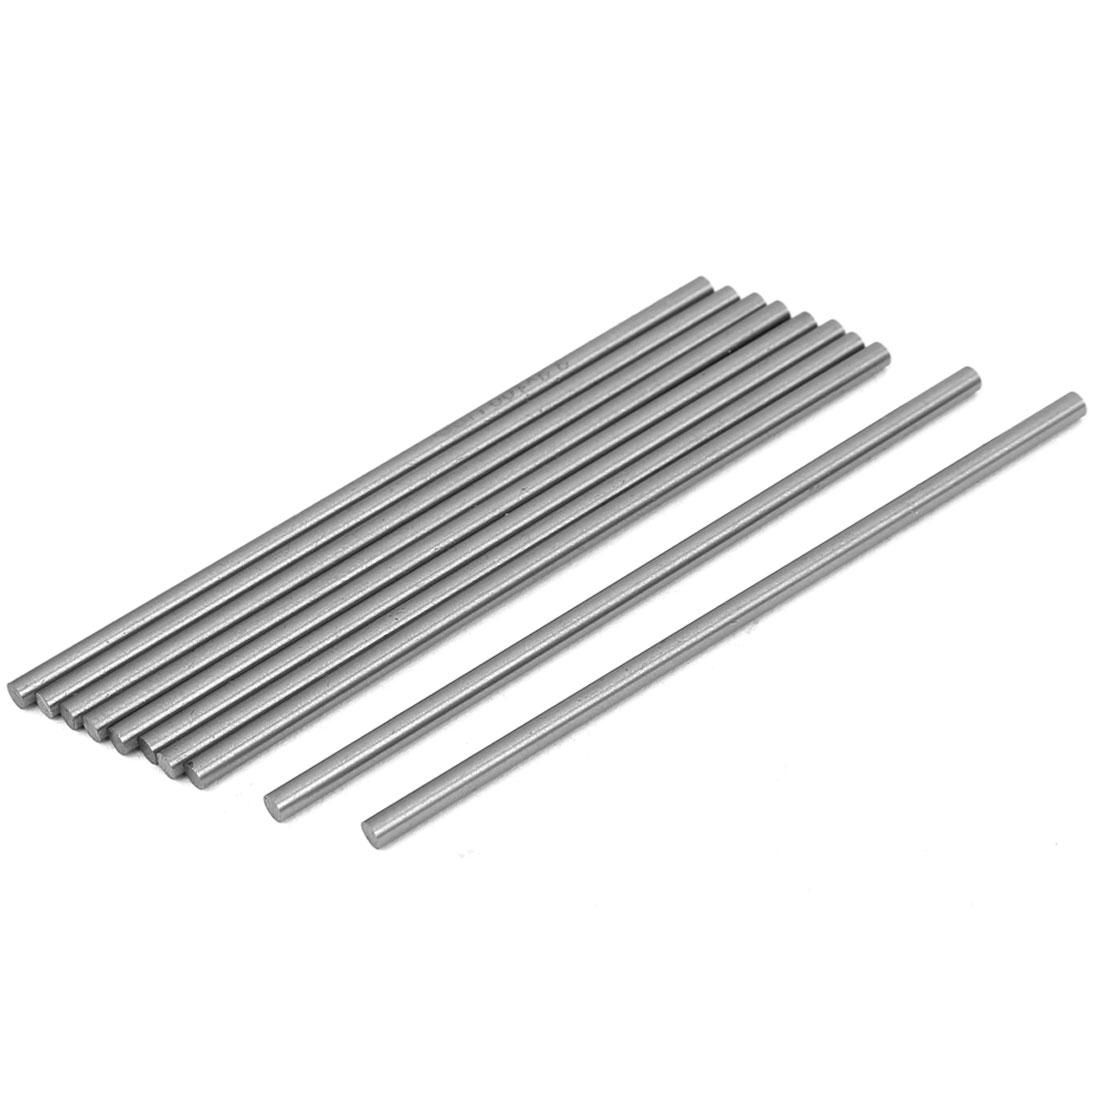 3.3mm x 100mm HSS Straight Machine Turning Tool Round Lathe Bar Rod Stick 10pcs